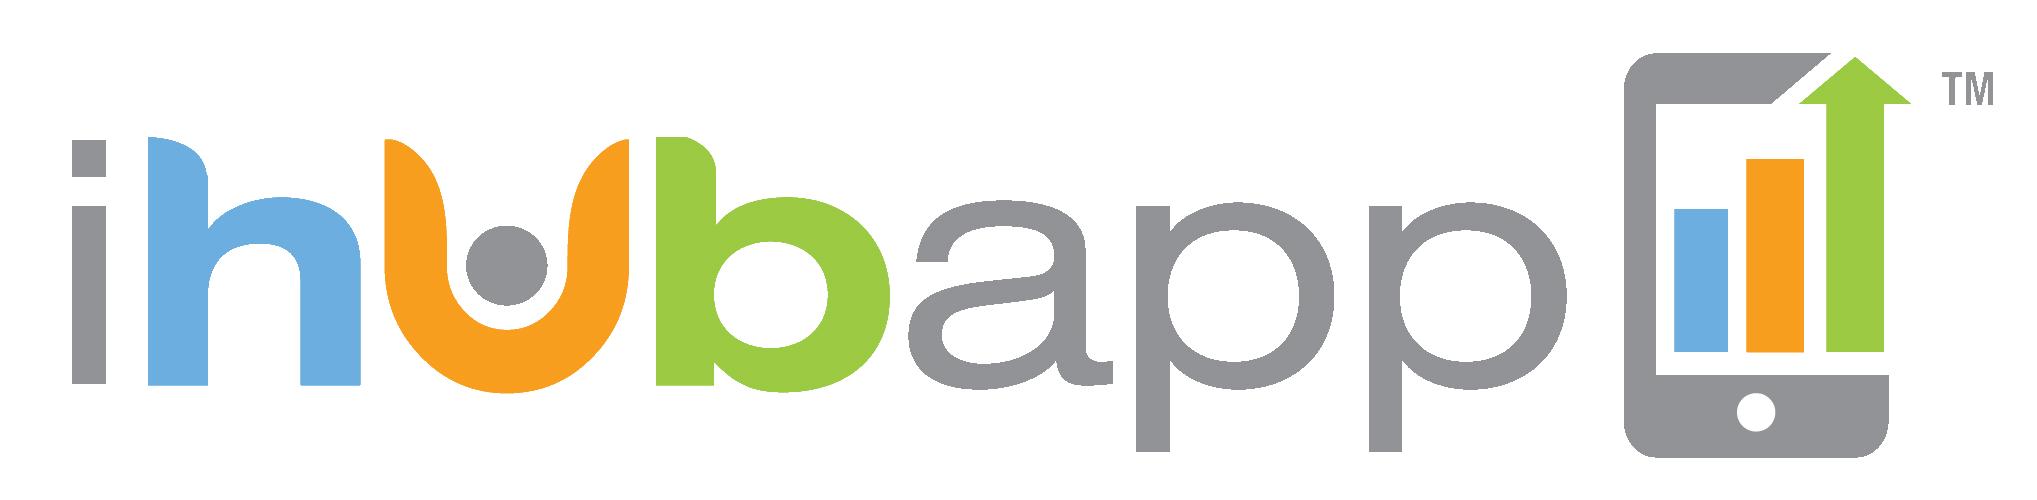 IHUBApp logo